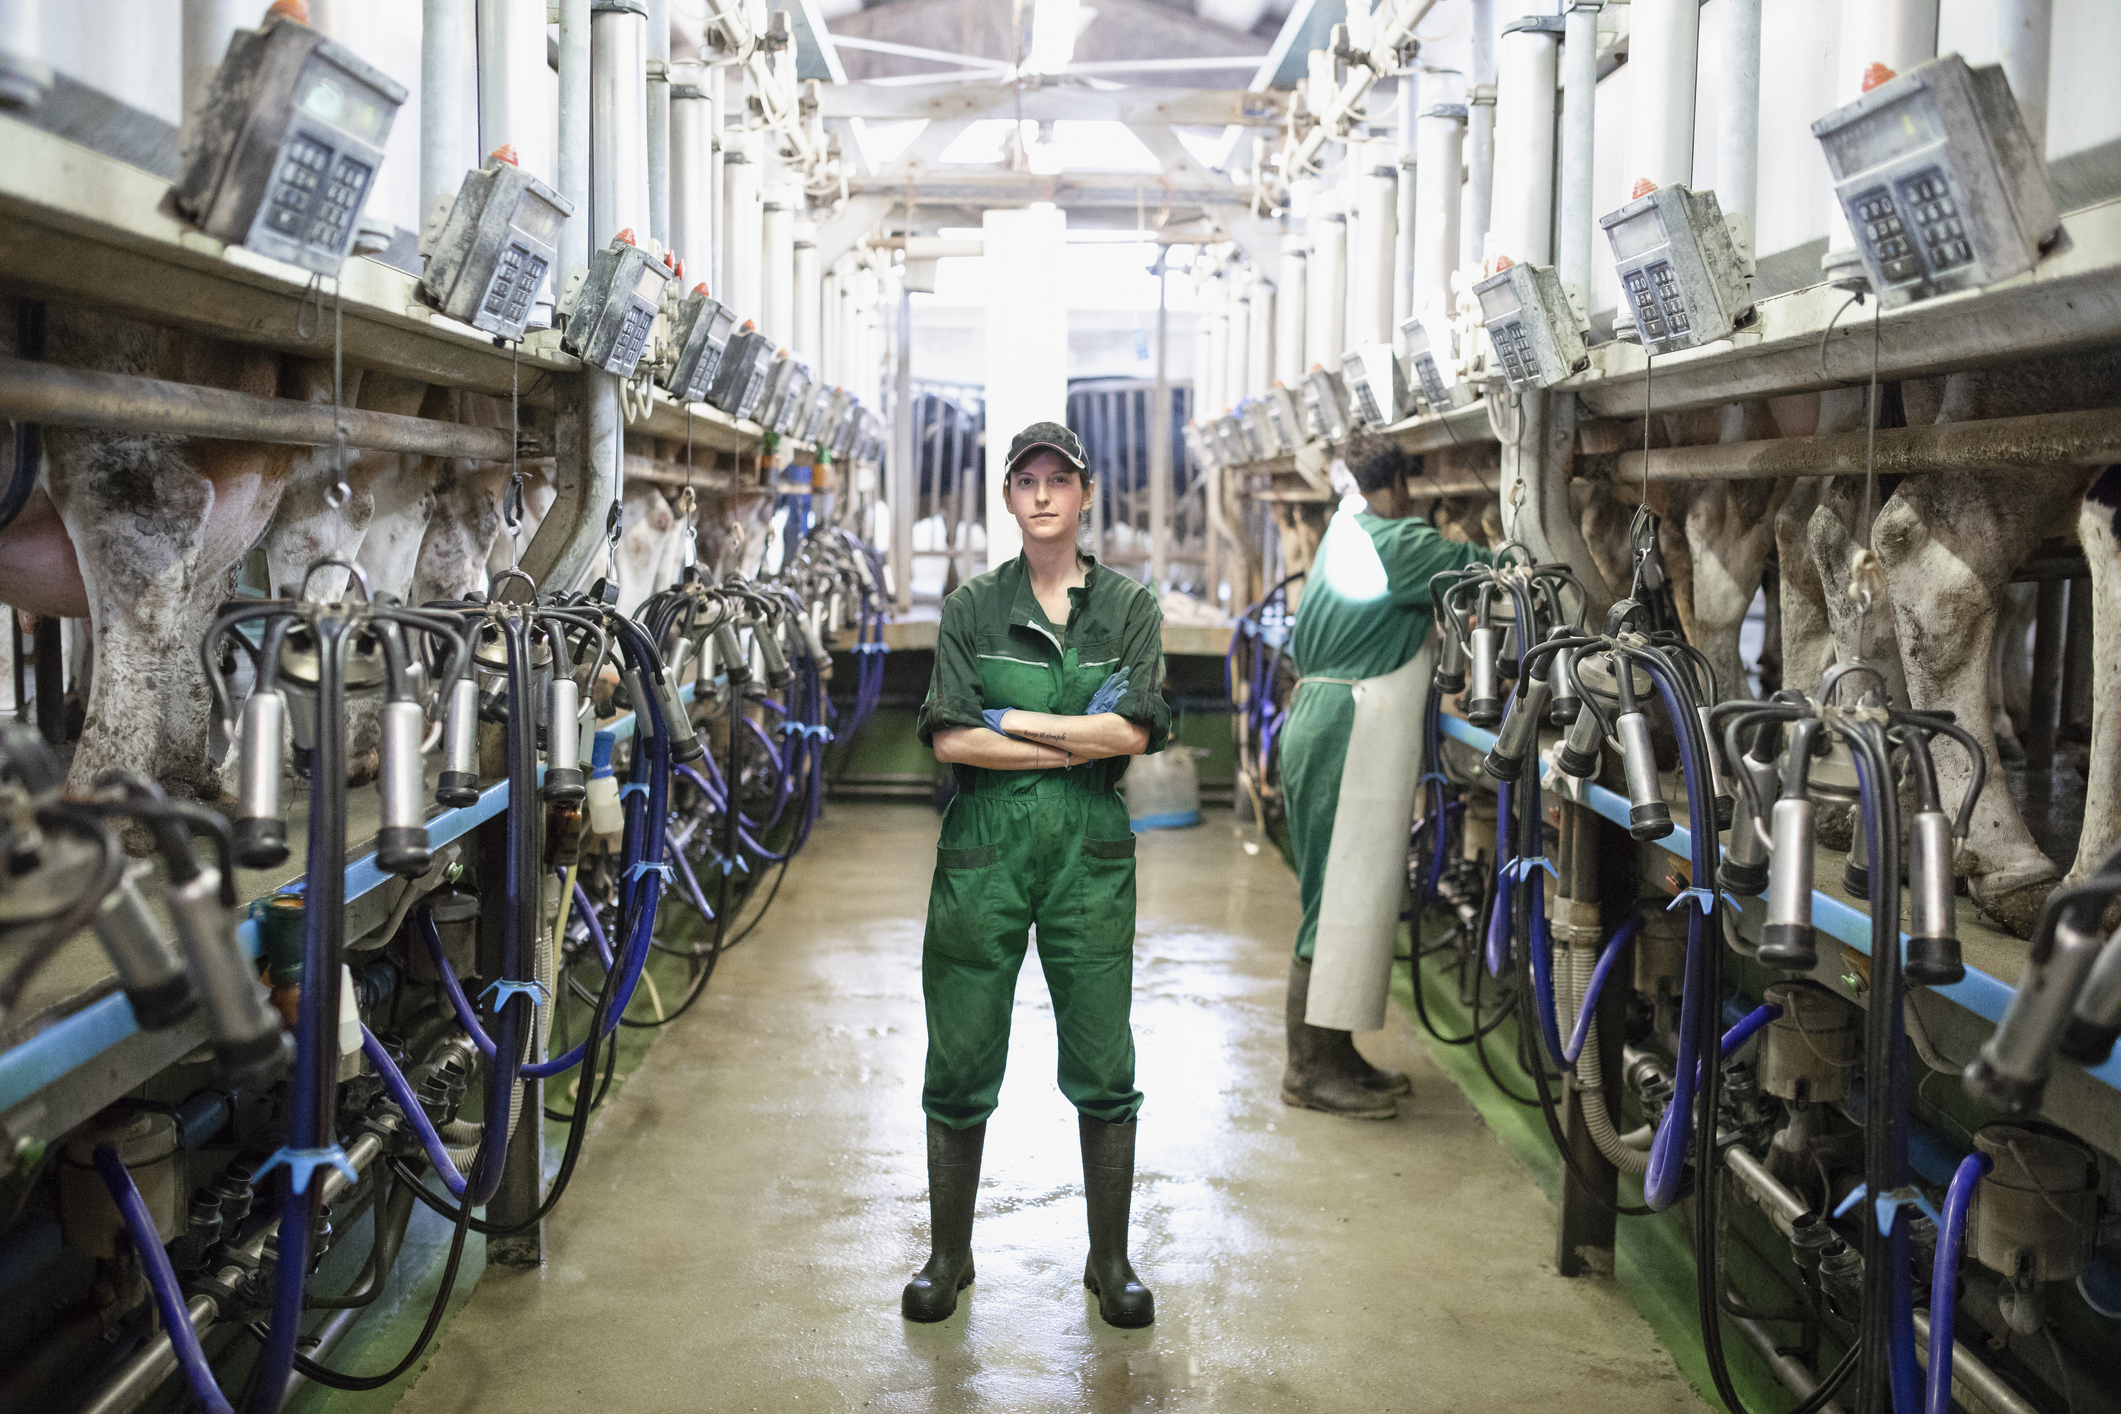 Female farm worker in a dairy barn